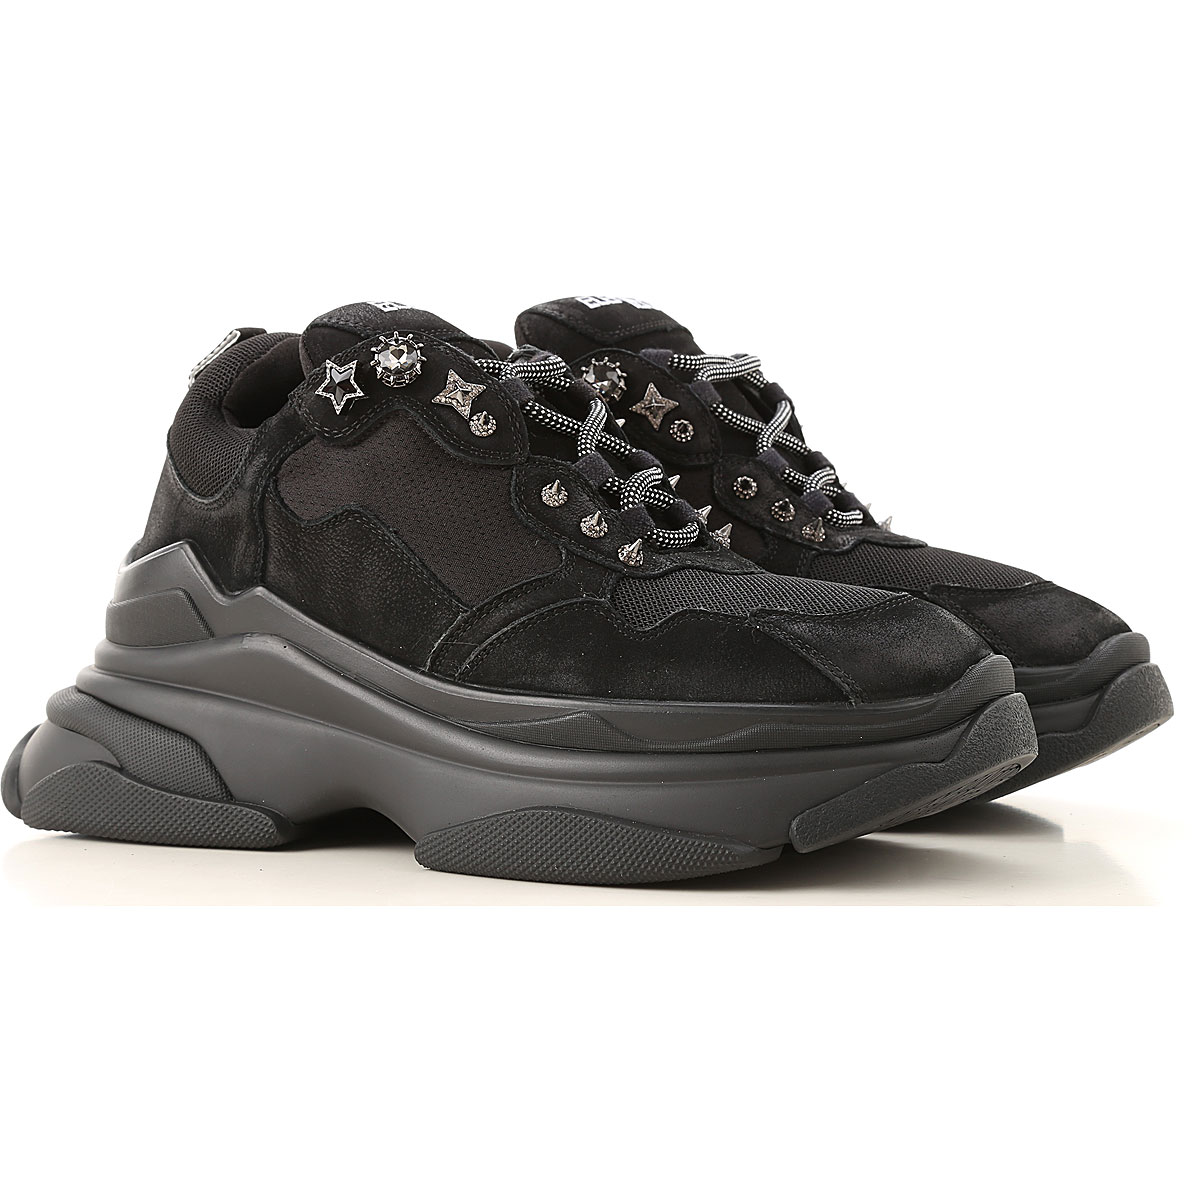 Elena Iachi Sneakers for Women On Sale, Black, Leather, 2019, 10 8 9